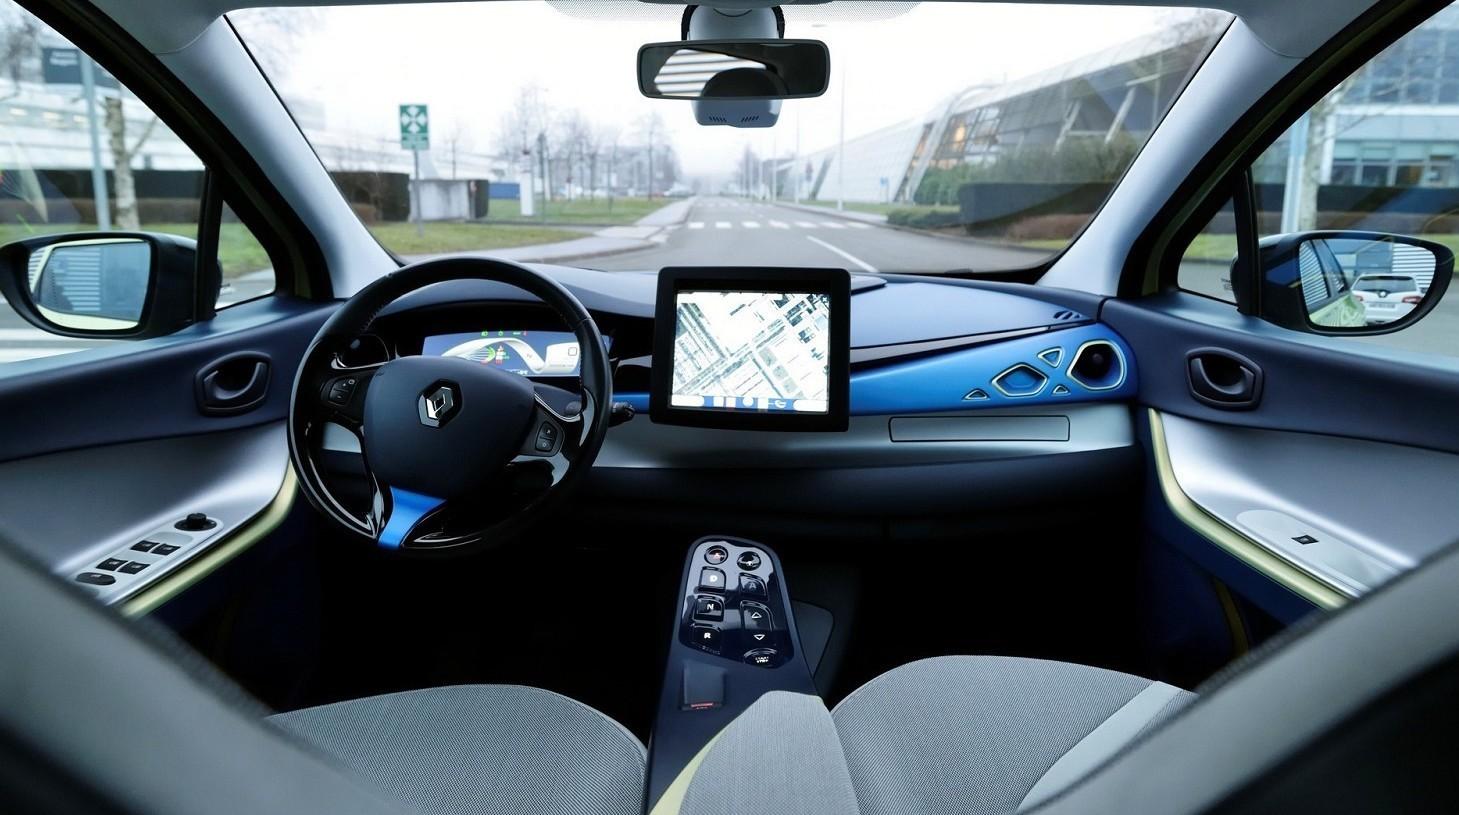 Auto guida autonoma iniziano i test in I